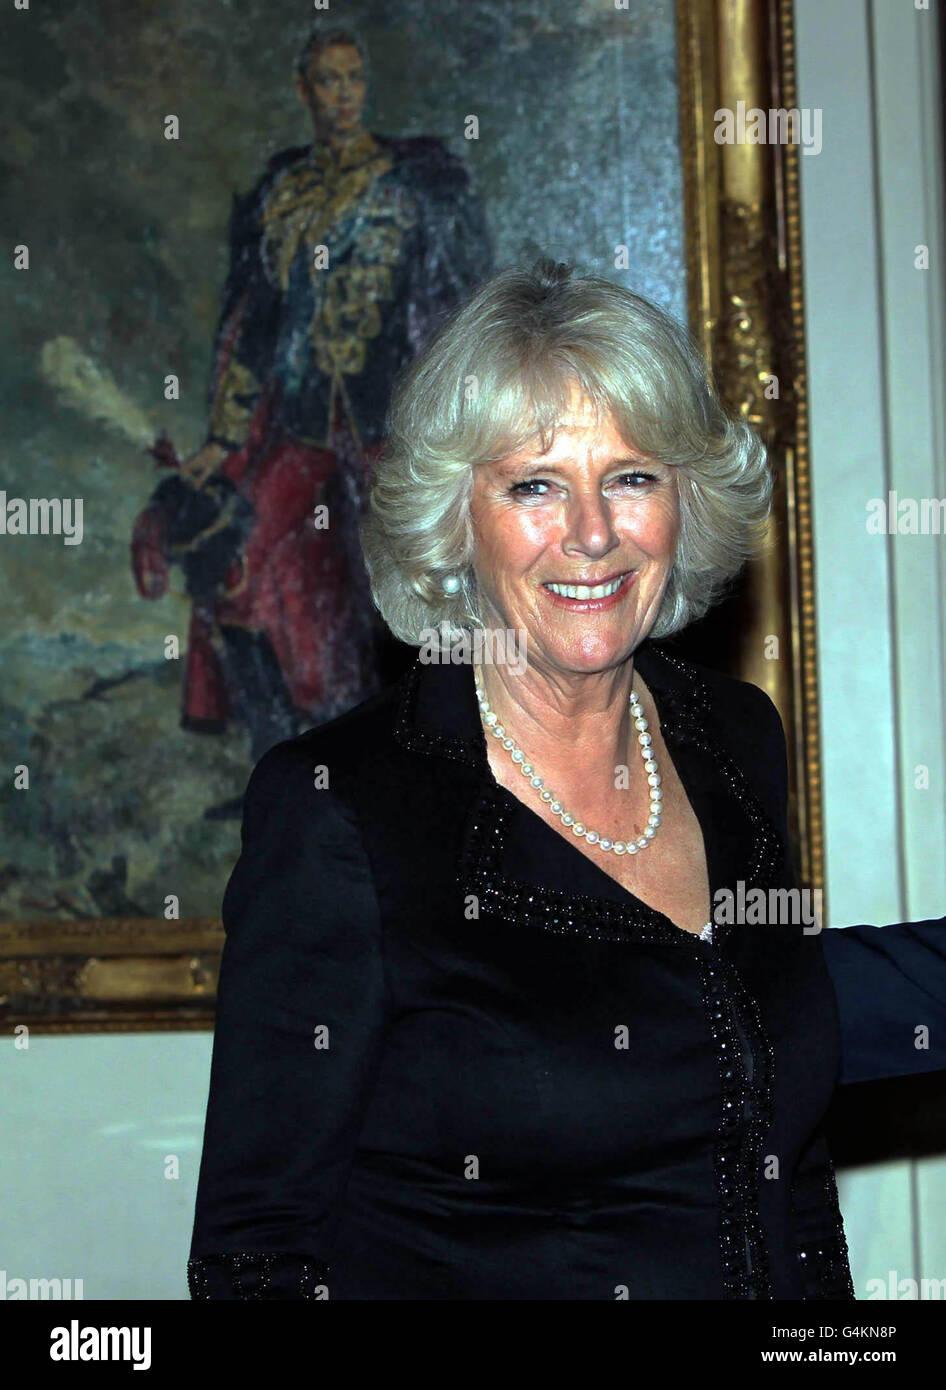 Lady Joseph Trust reception - Stock Image